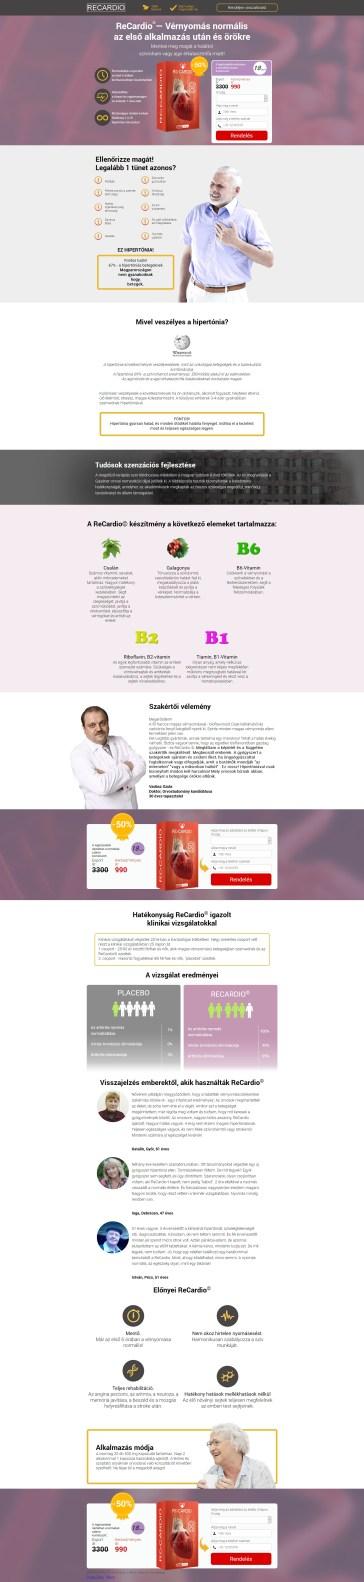 magas vérnyomás-gátlók veloergometria hipertónia